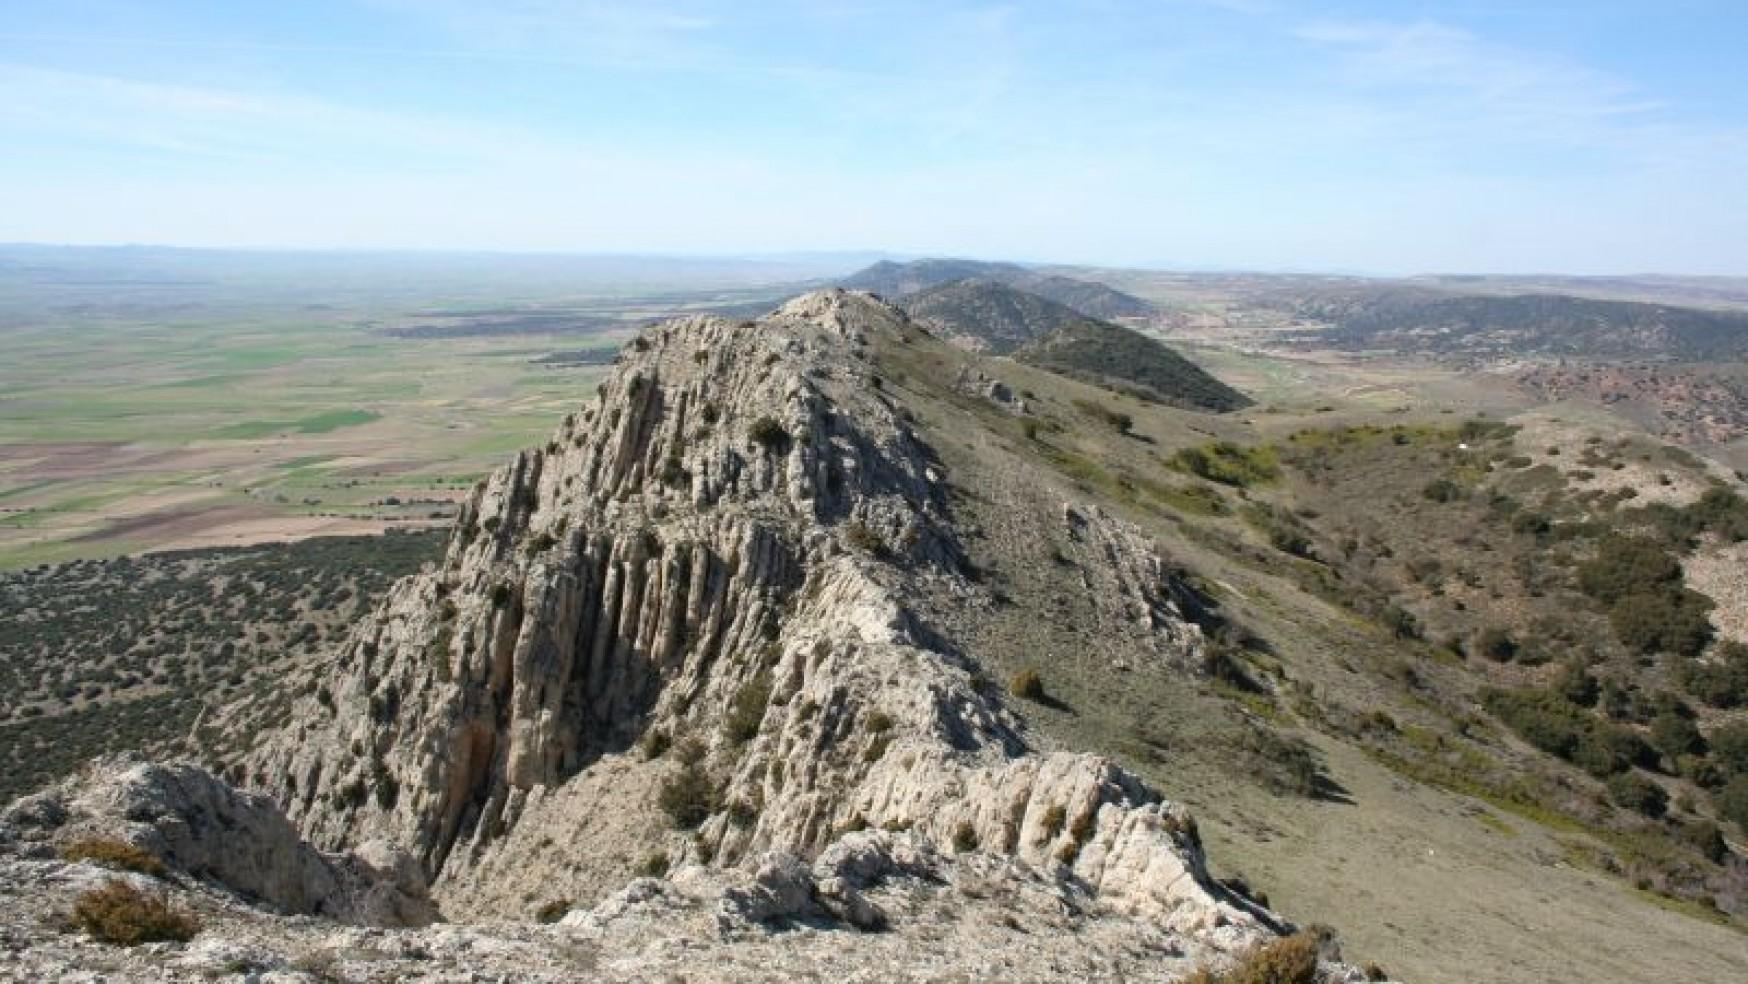 Ruta senderista Sierra Palomera // 30 de abril